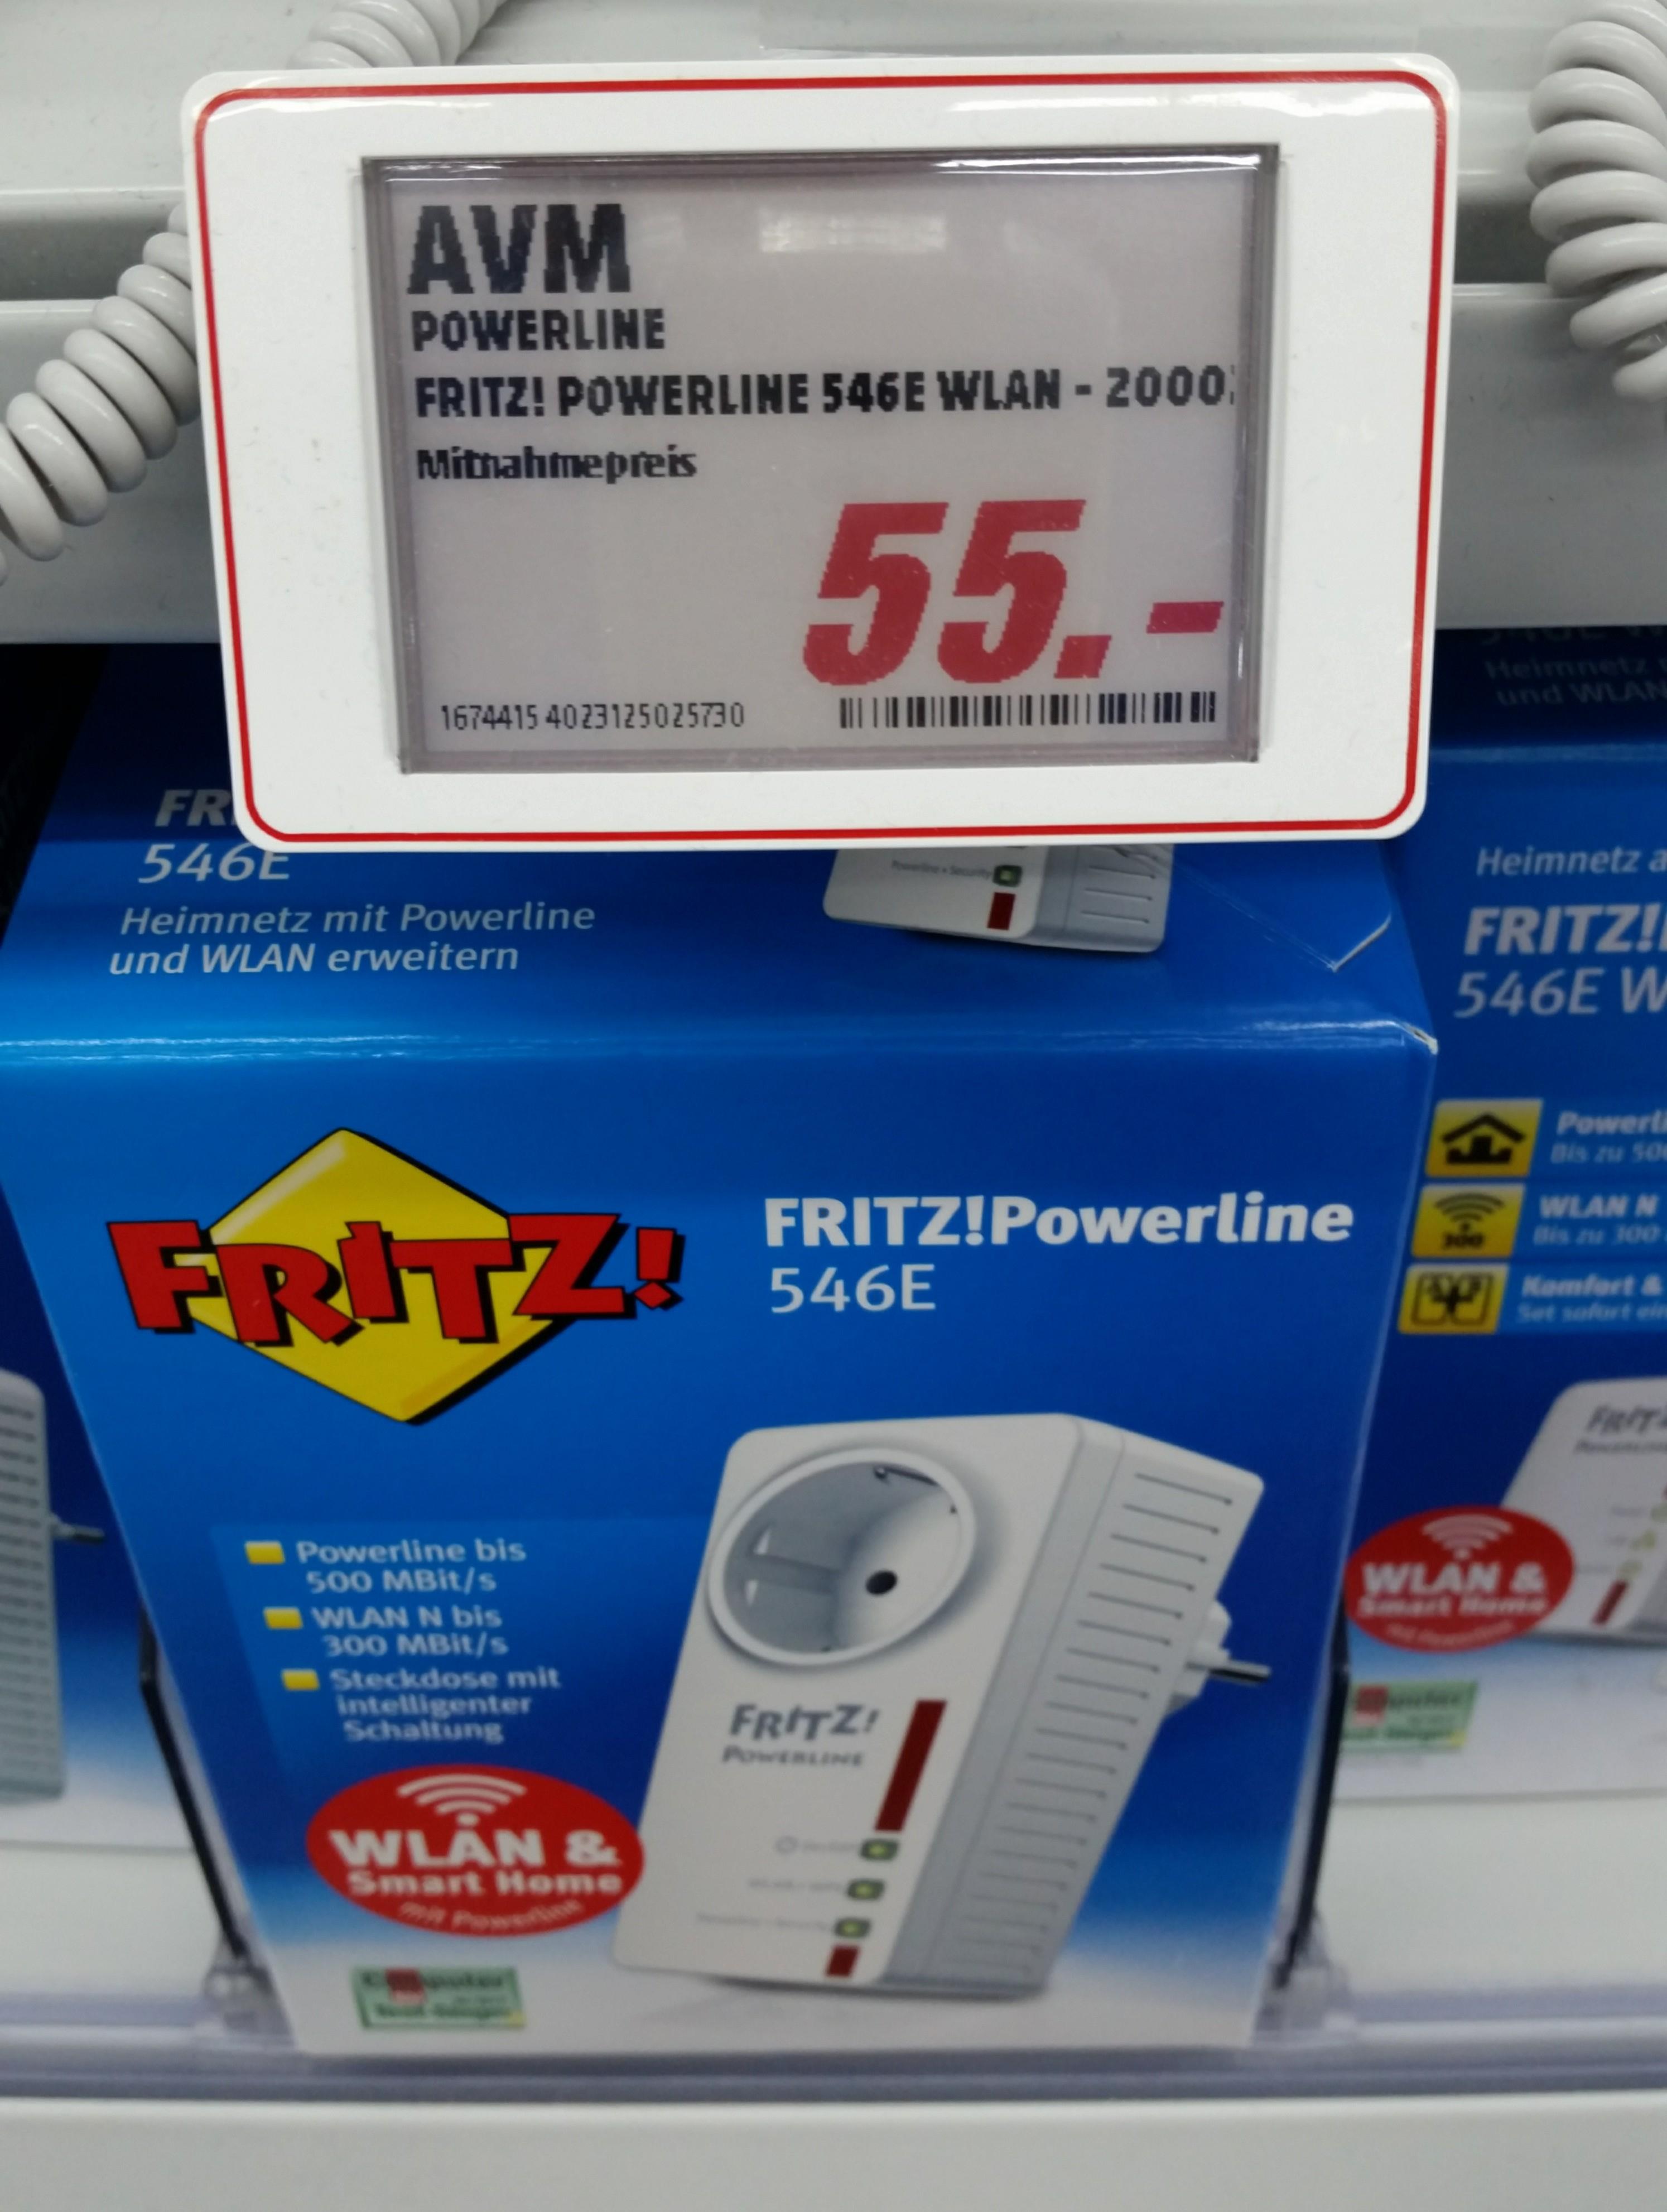 AVM FRITZ!Powerline 546E Media Markt Neumarkt 30% unter Idealo